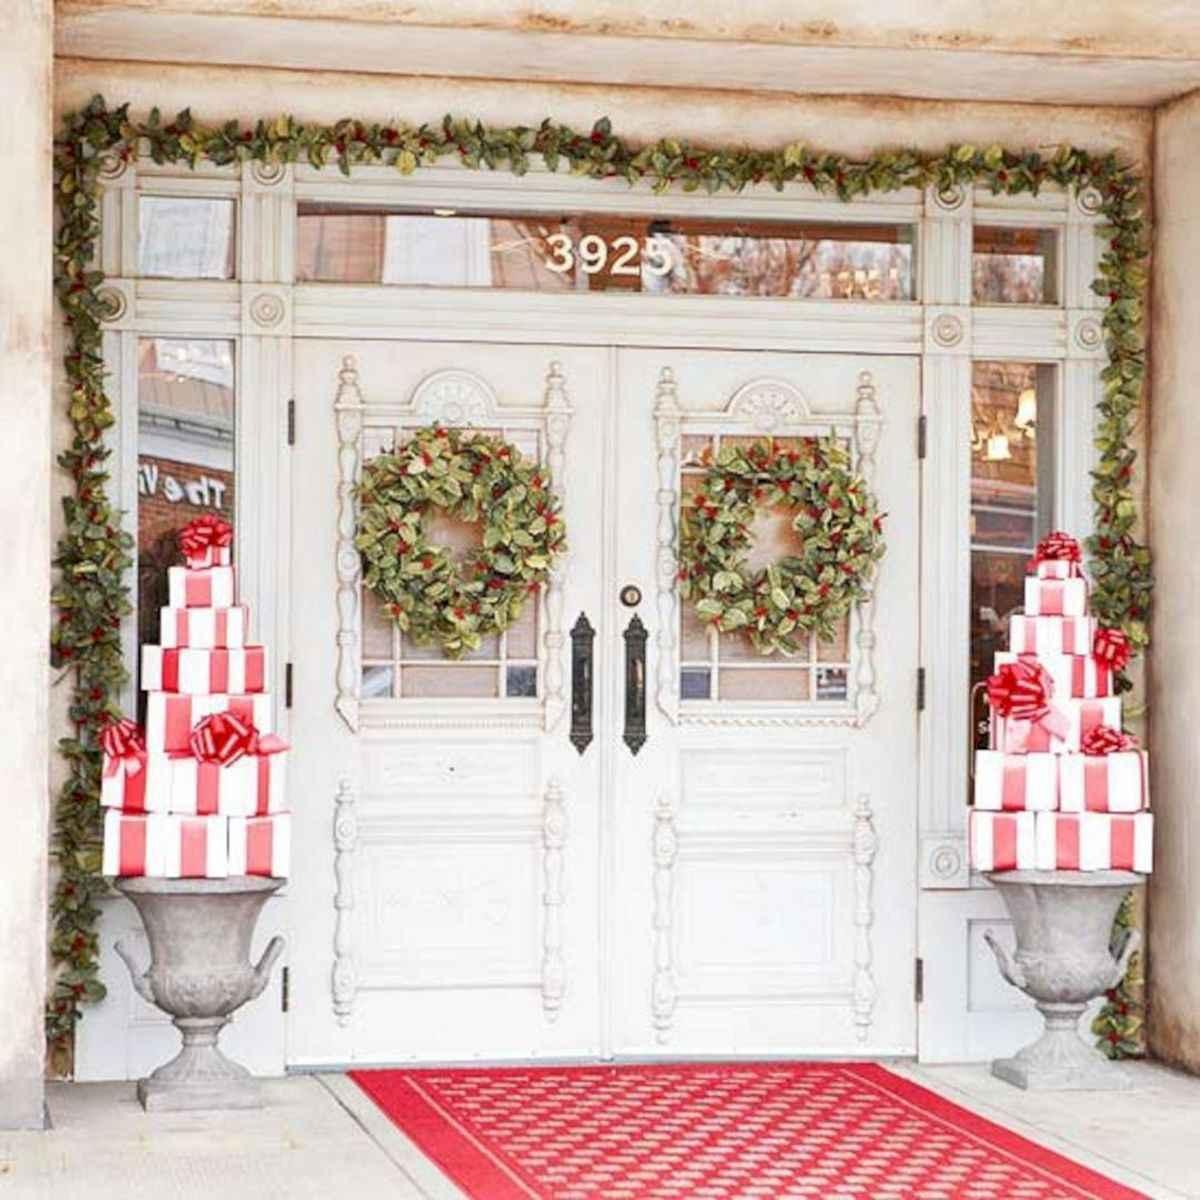 50 Creative Christmas Front Porch Decor Ideas And Design (25)